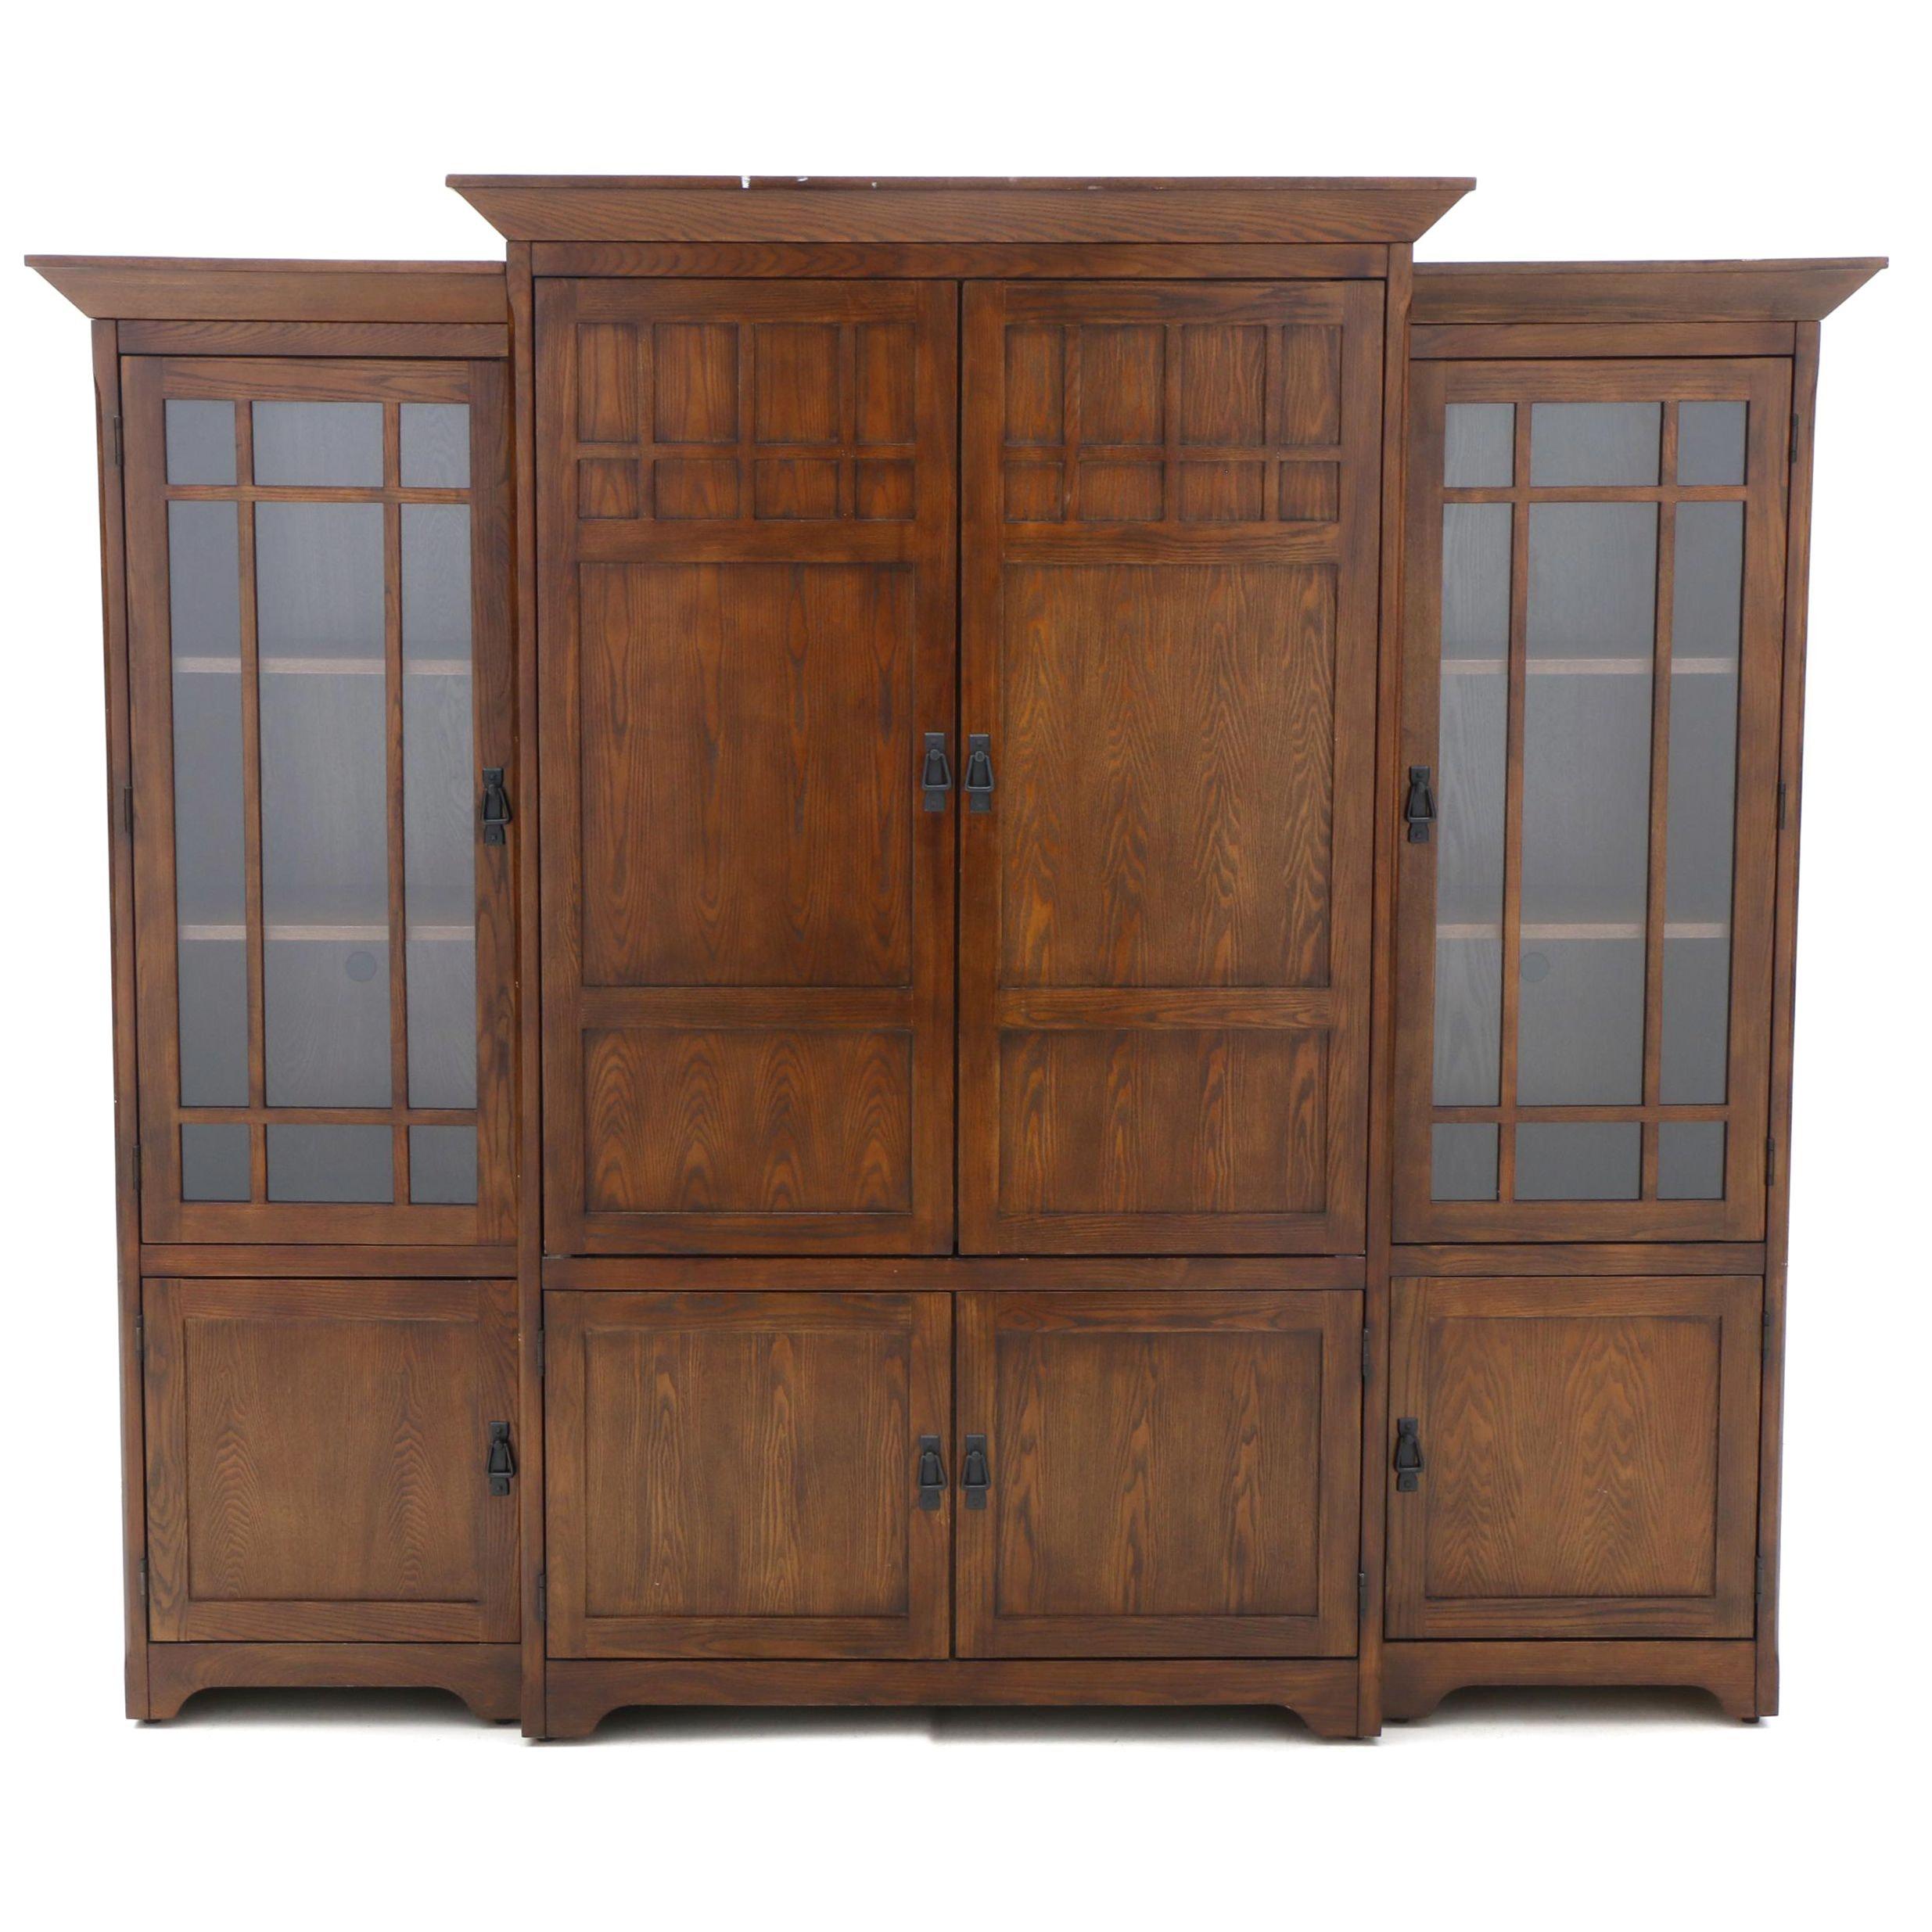 Arts and Crafts Style Oak Three Piece Media Cabinet, 21st Century